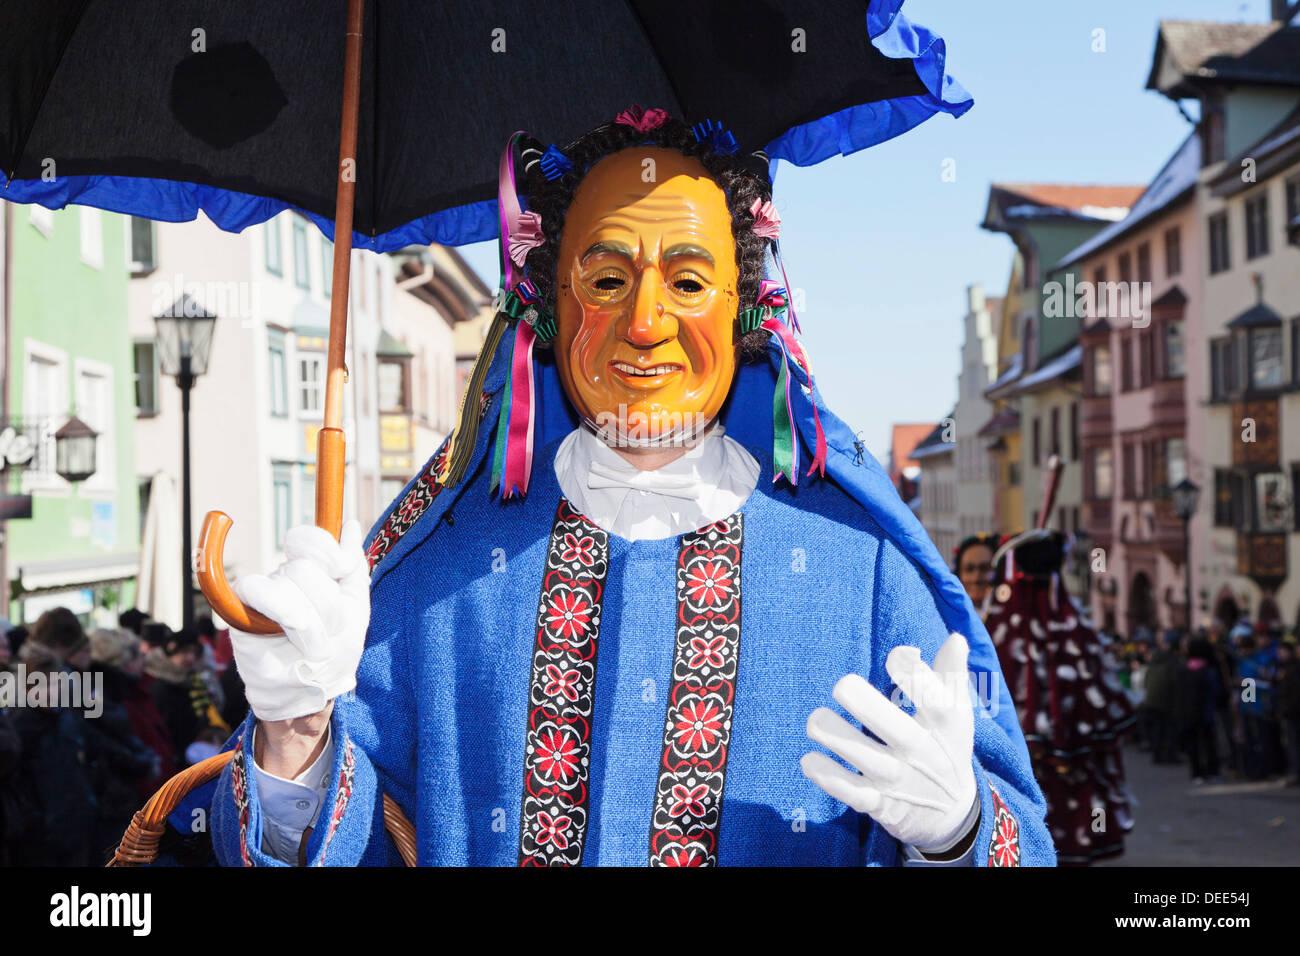 Uomo in costume tradizionale (Schantle), Narrensprung, Rottweiler Fasnet, Rottweil, Foresta Nera, Baden Wurttemberg, Germania Immagini Stock